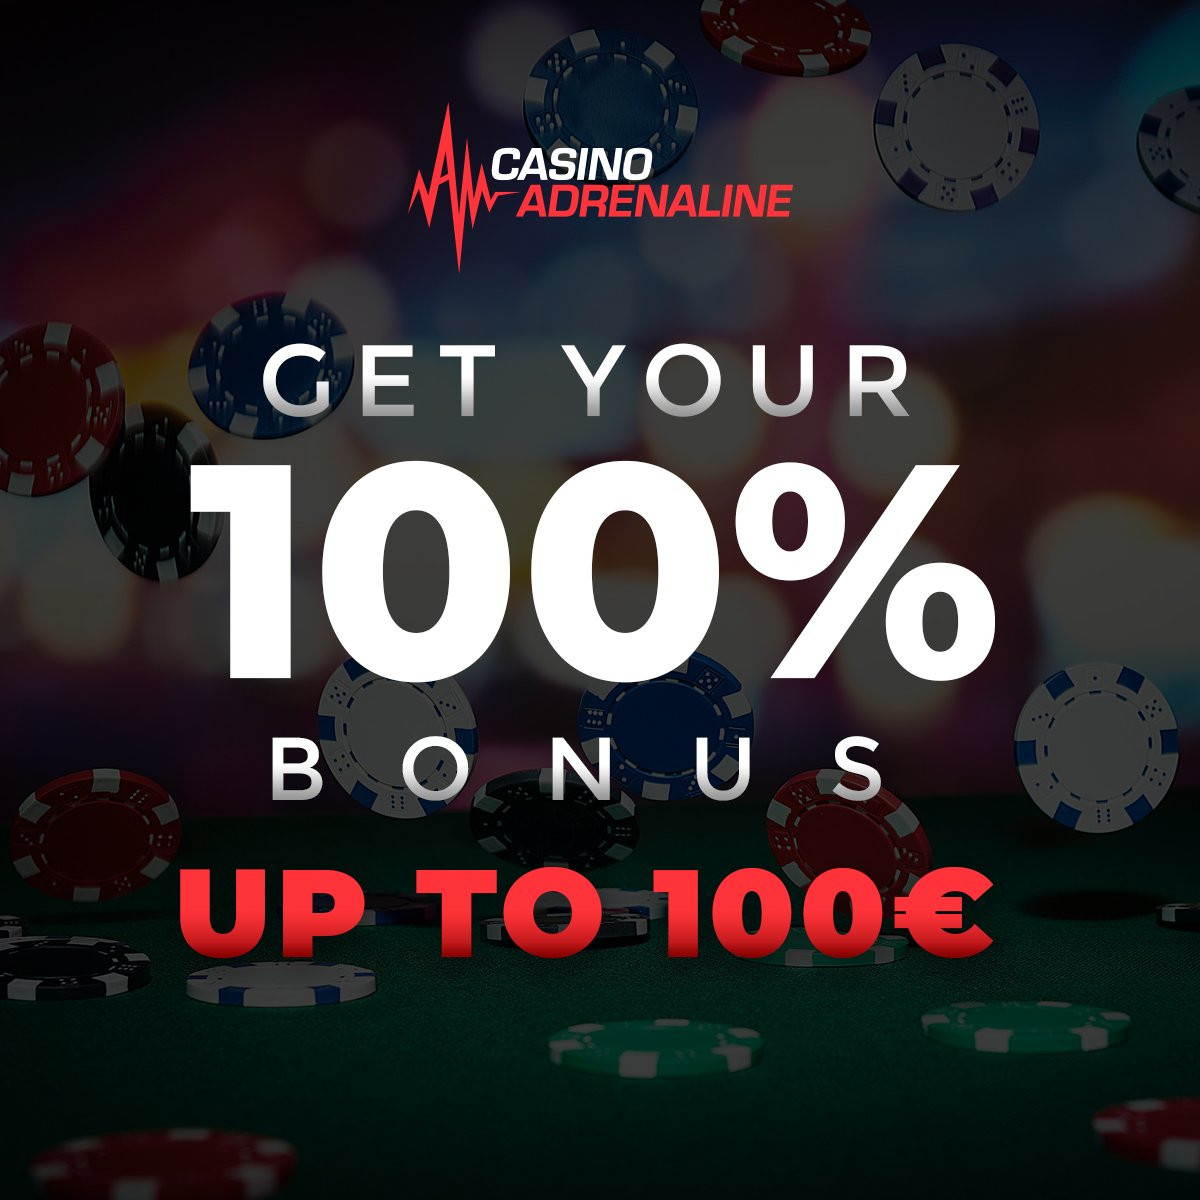 test Twitter Media - This Sunday challenge your luck with 100% bonus up to 100 EUR. 50x bonus and deposit! 😉😎#CasinoAdrenaline #TotalJackpot #CasinoAdrenalingaming #casinos #slot #casinoluck #enjoythegame https://t.co/6w2i0Qe1TE